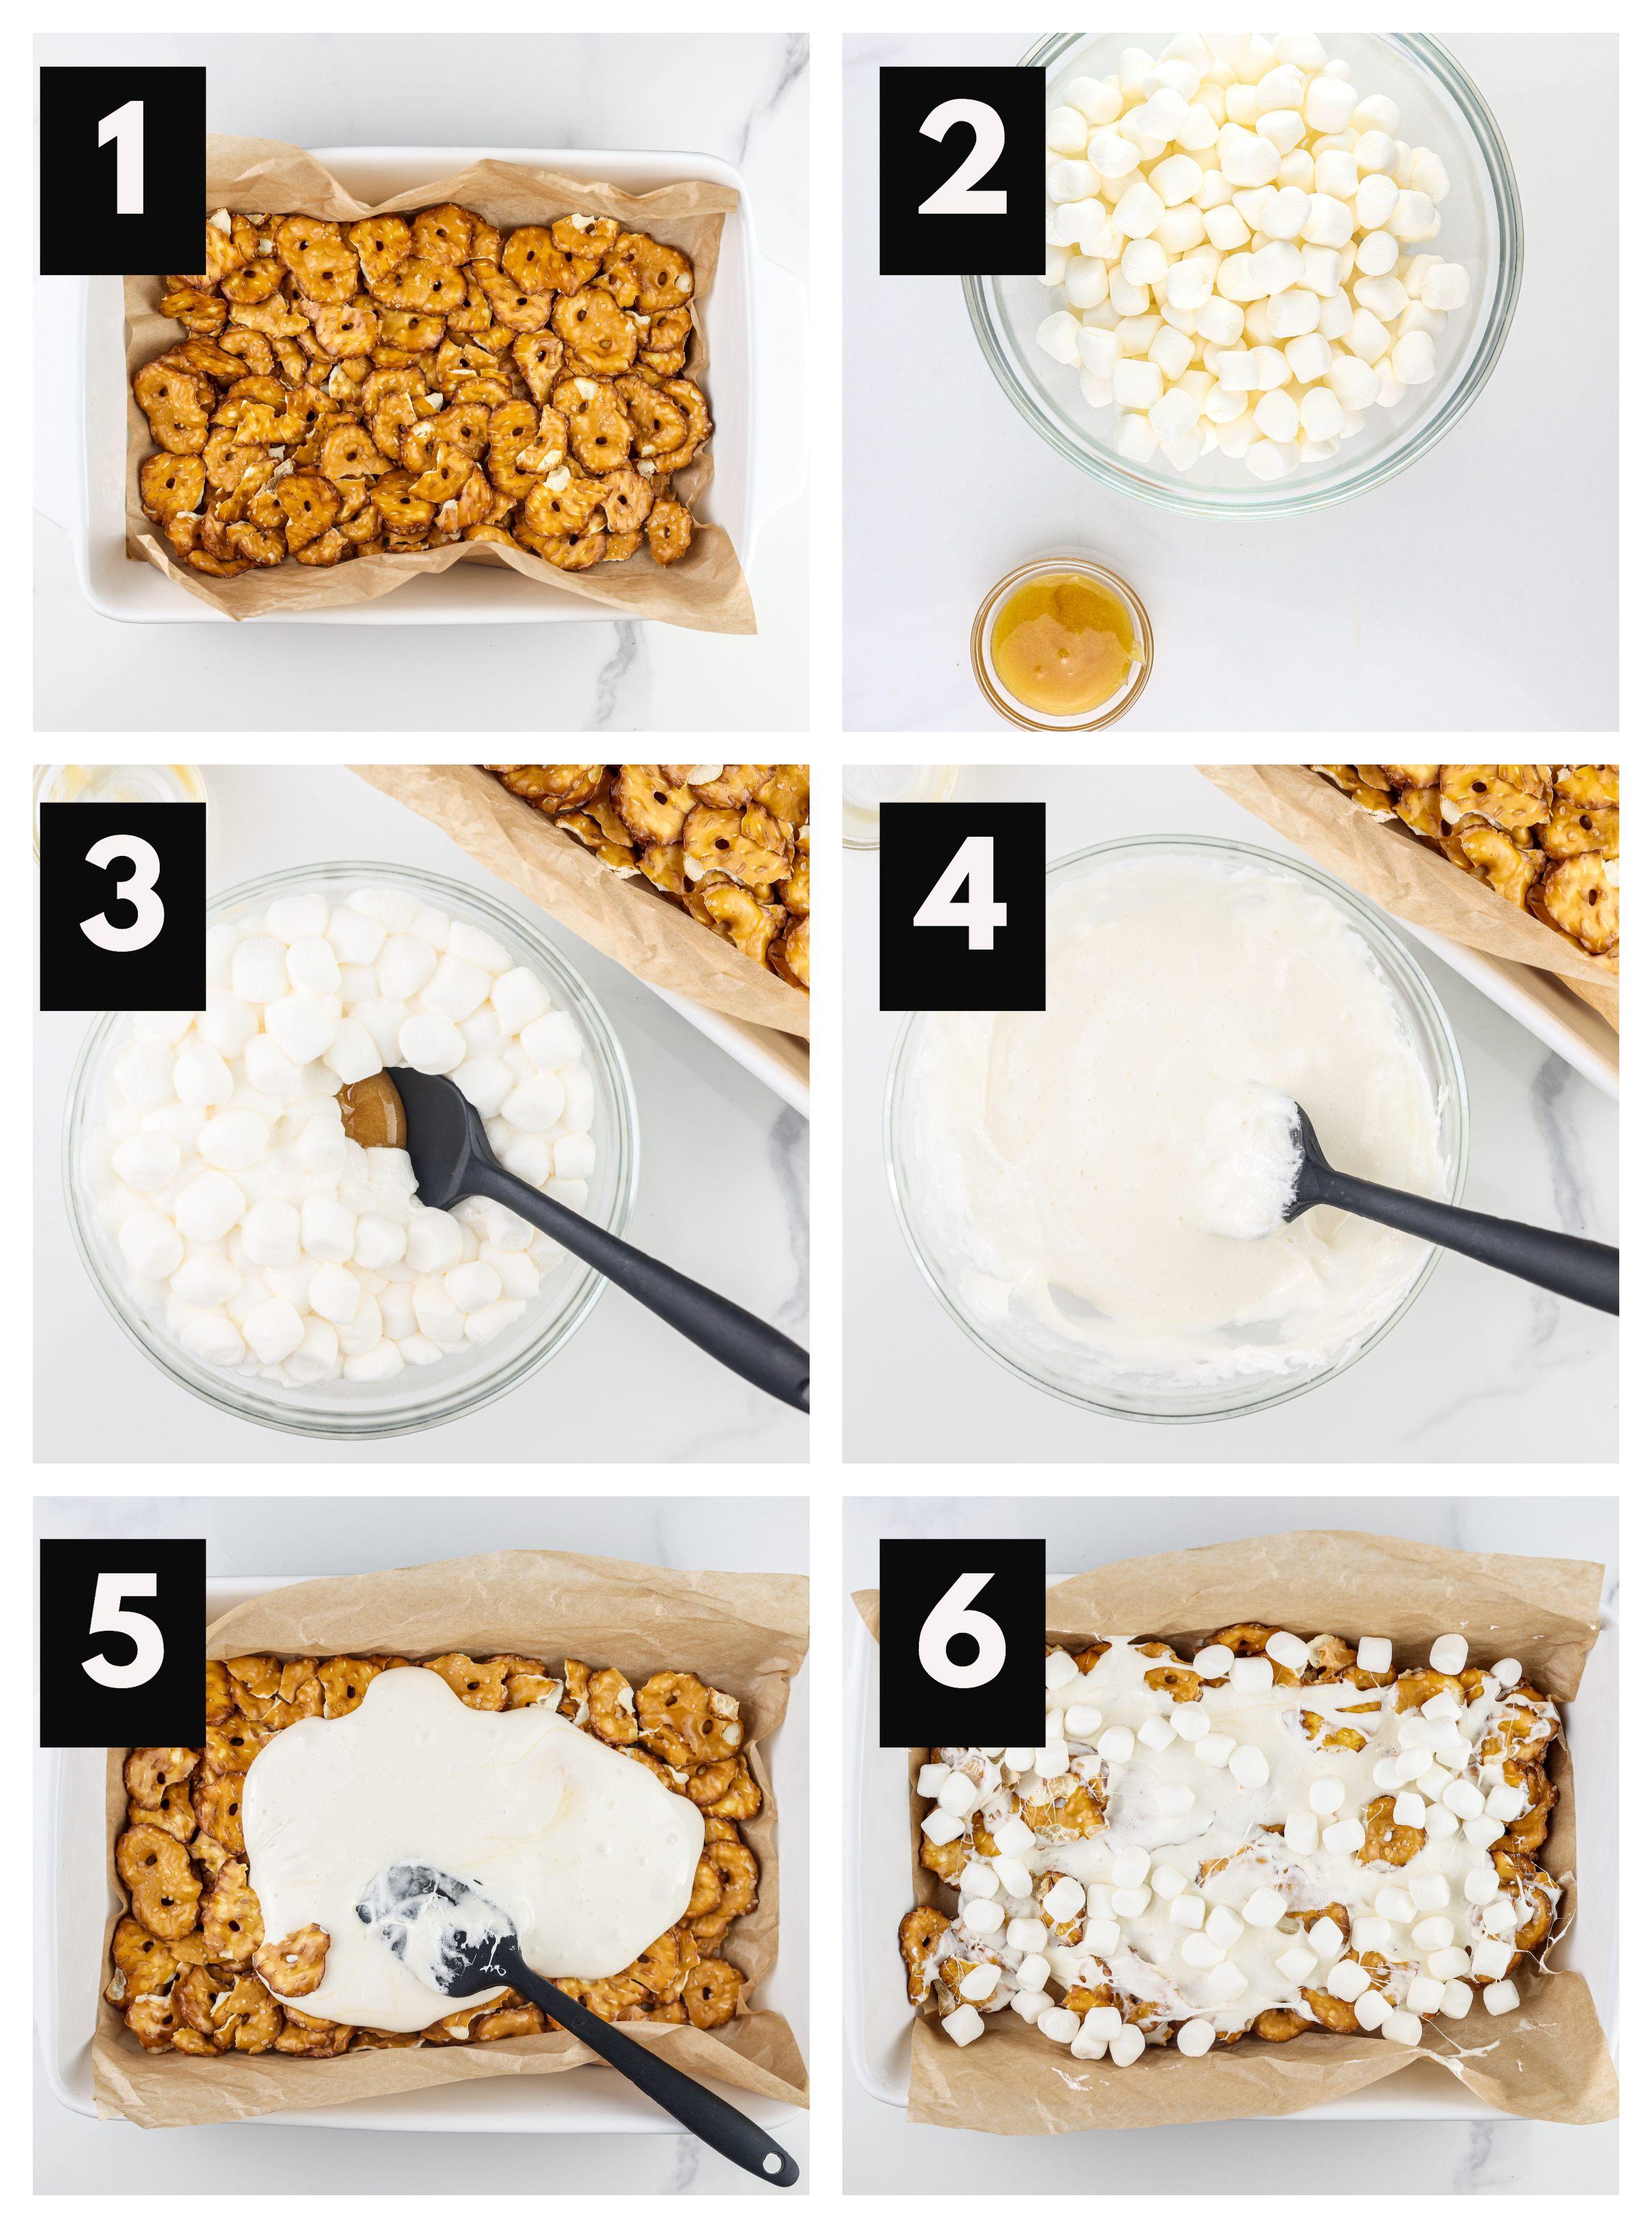 Process shots to melt marshmallows and slather on bark.